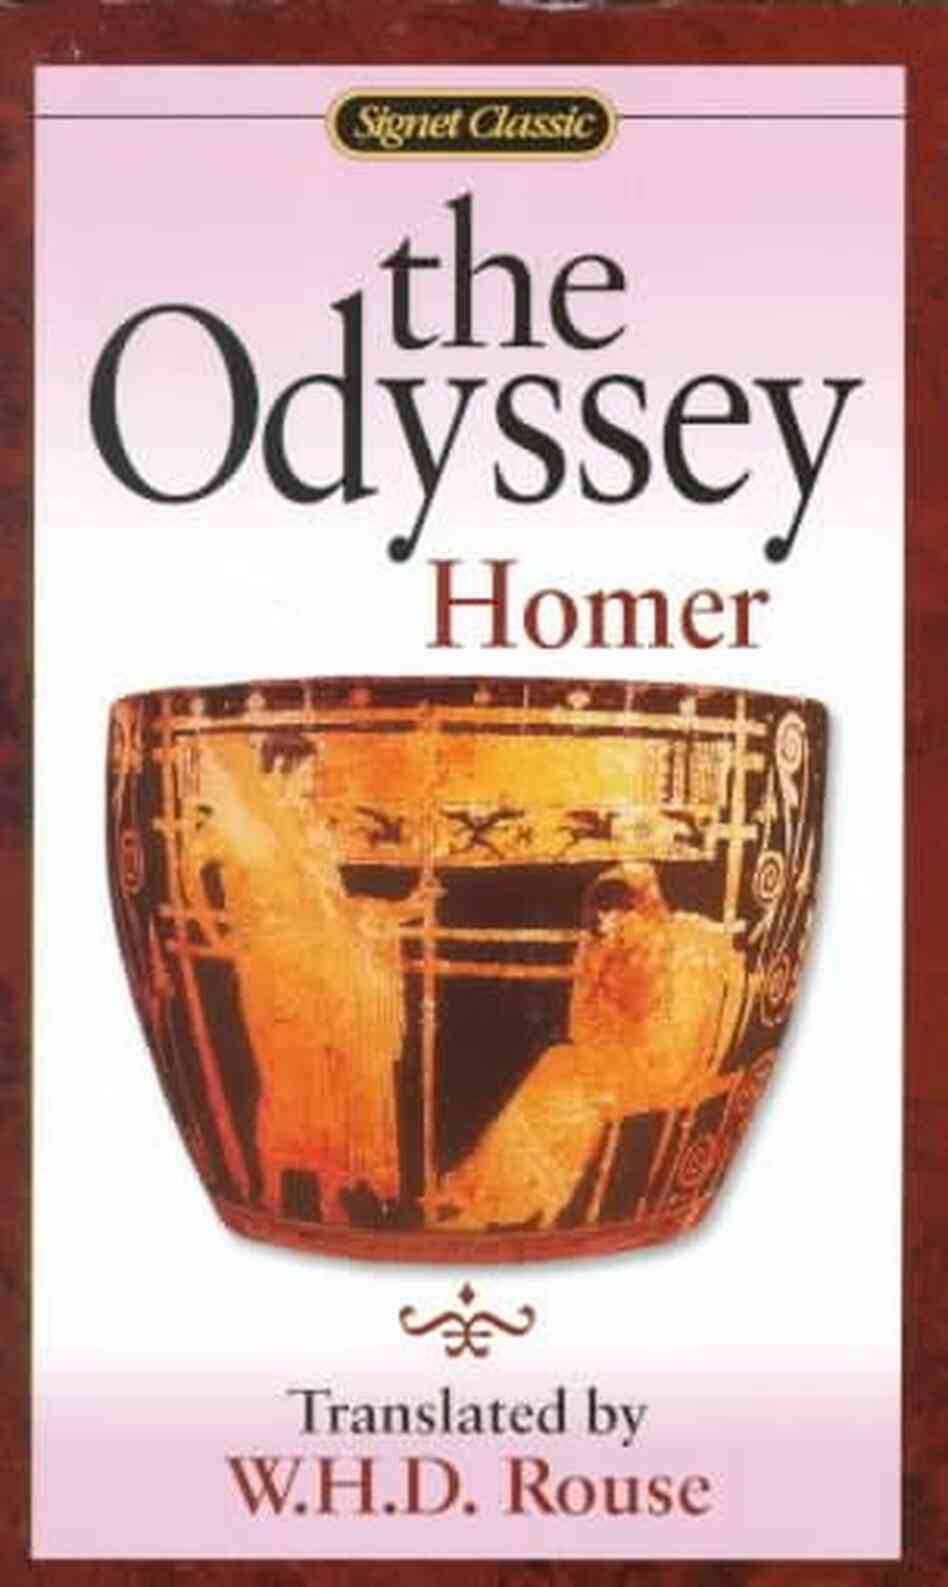 essay on odssey book 6